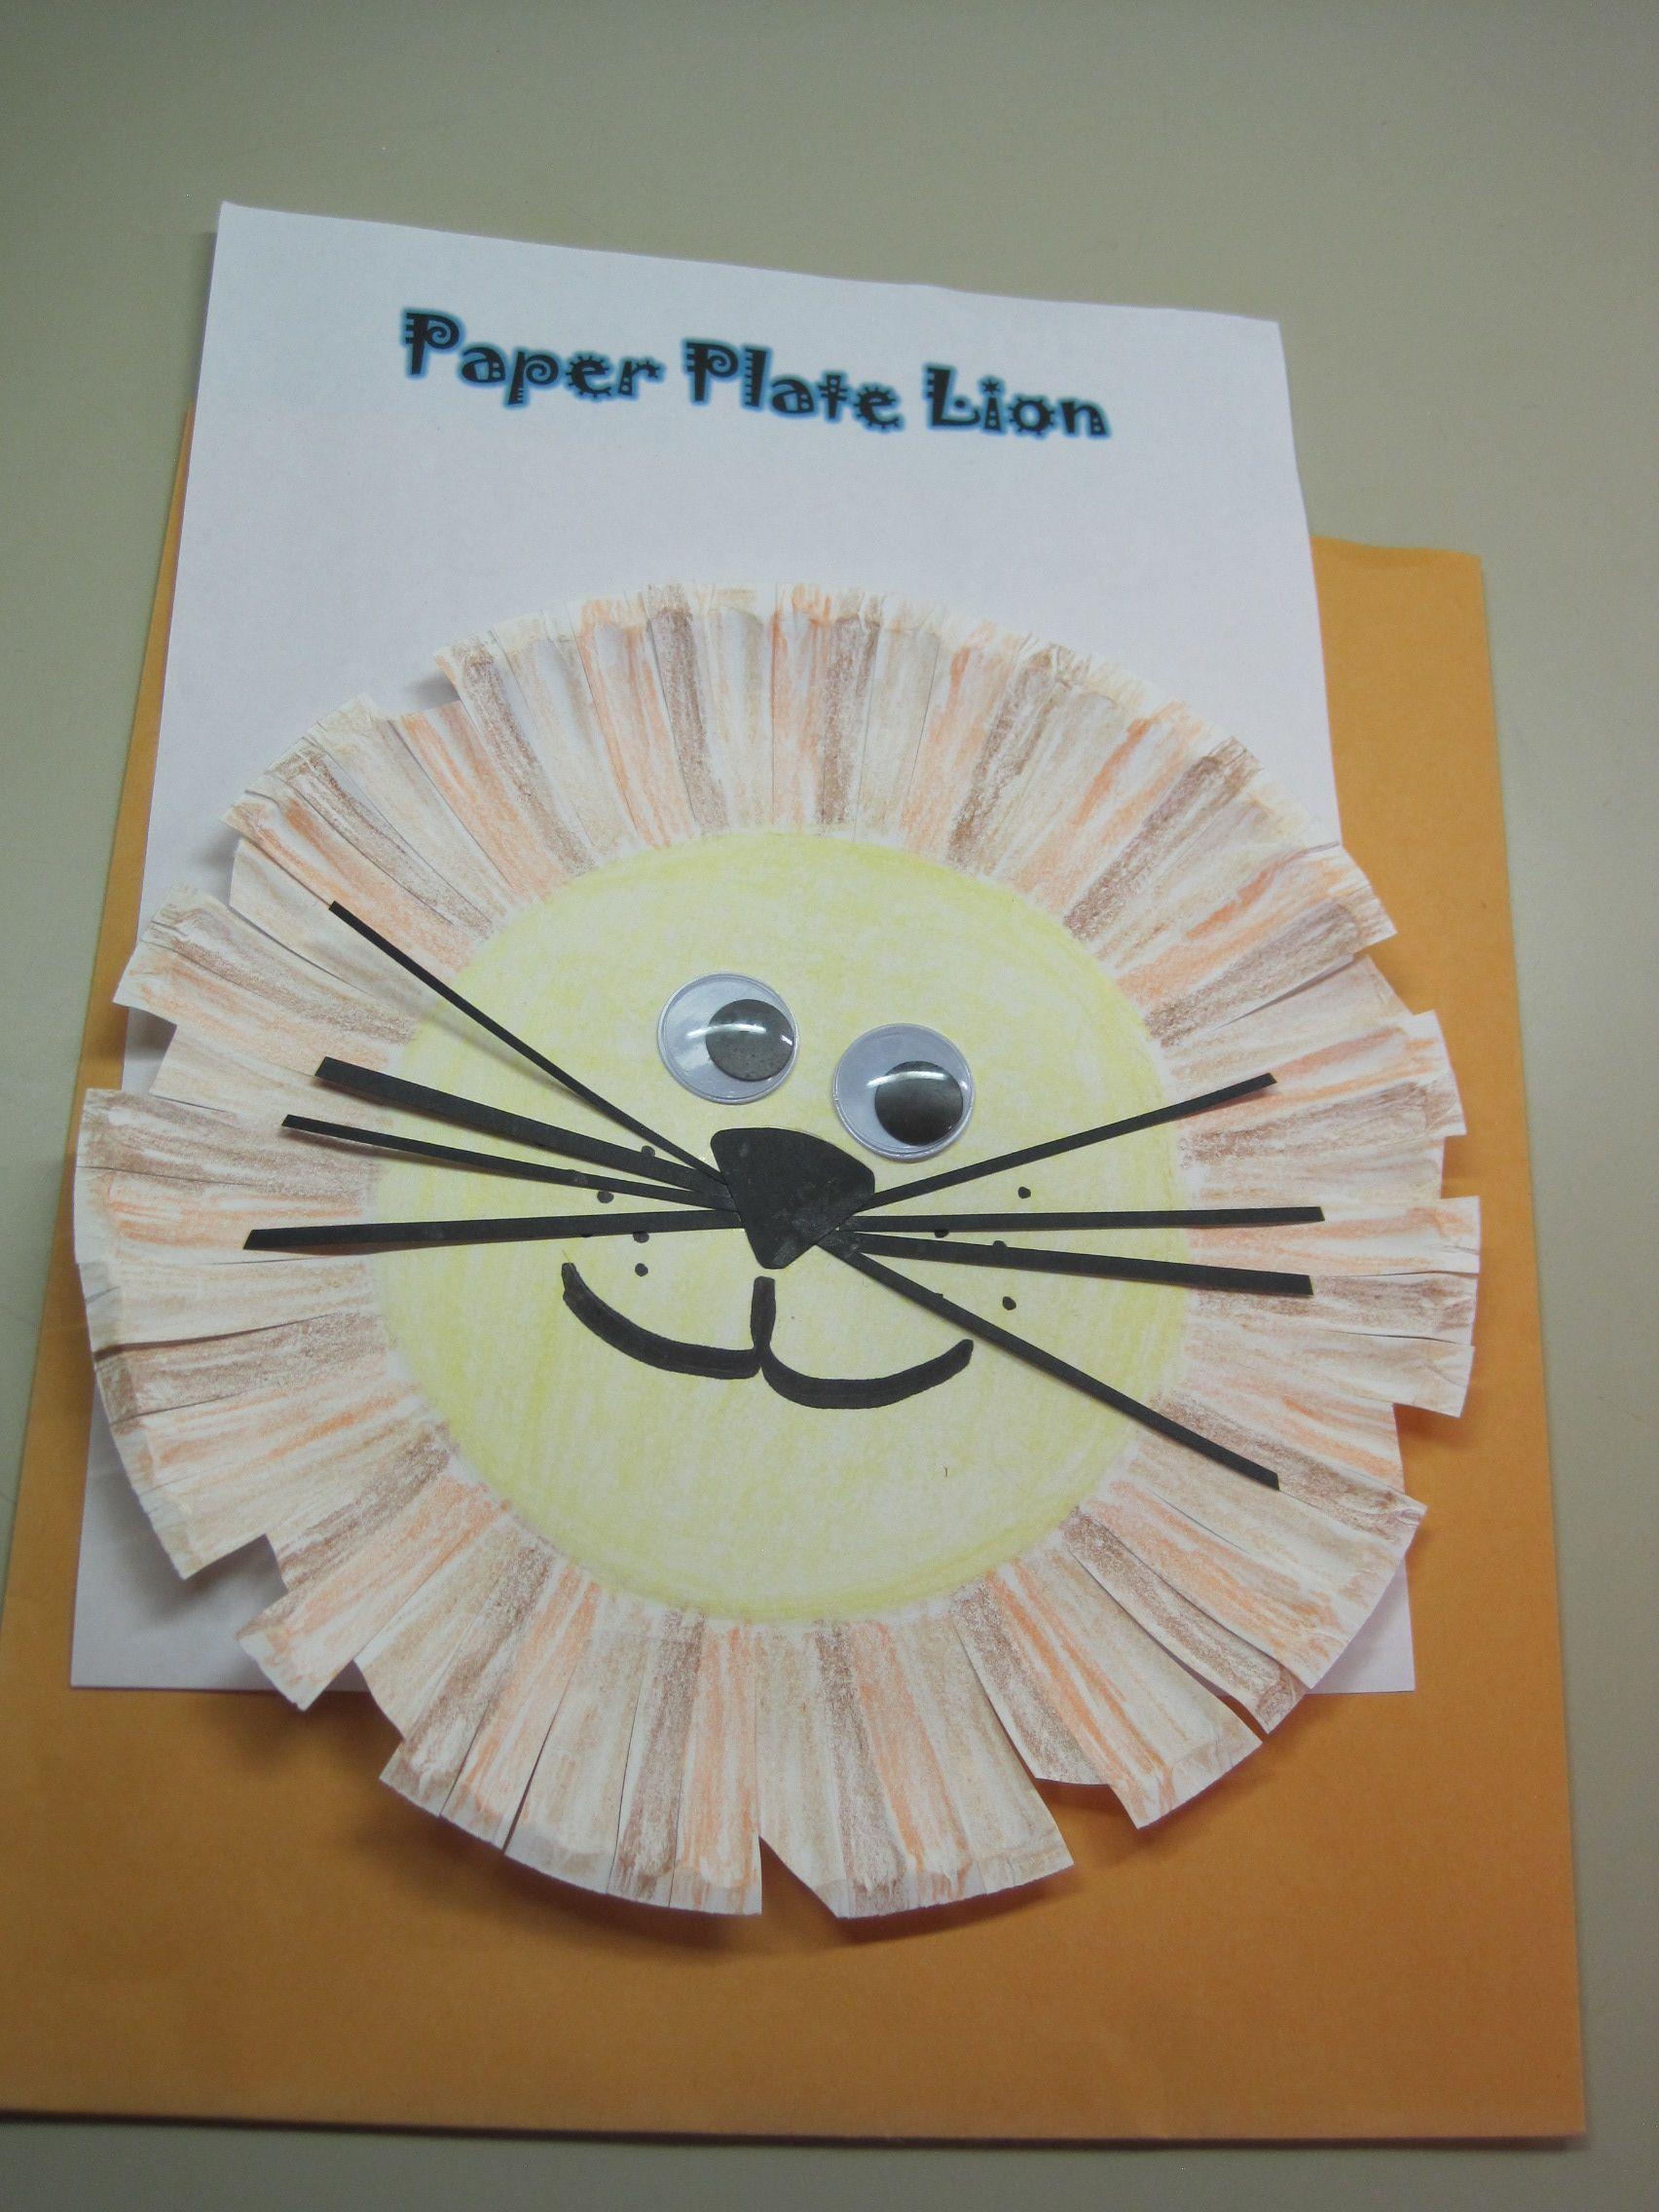 Paper Plate Lion Cslp Children S Manual P 218 Craft